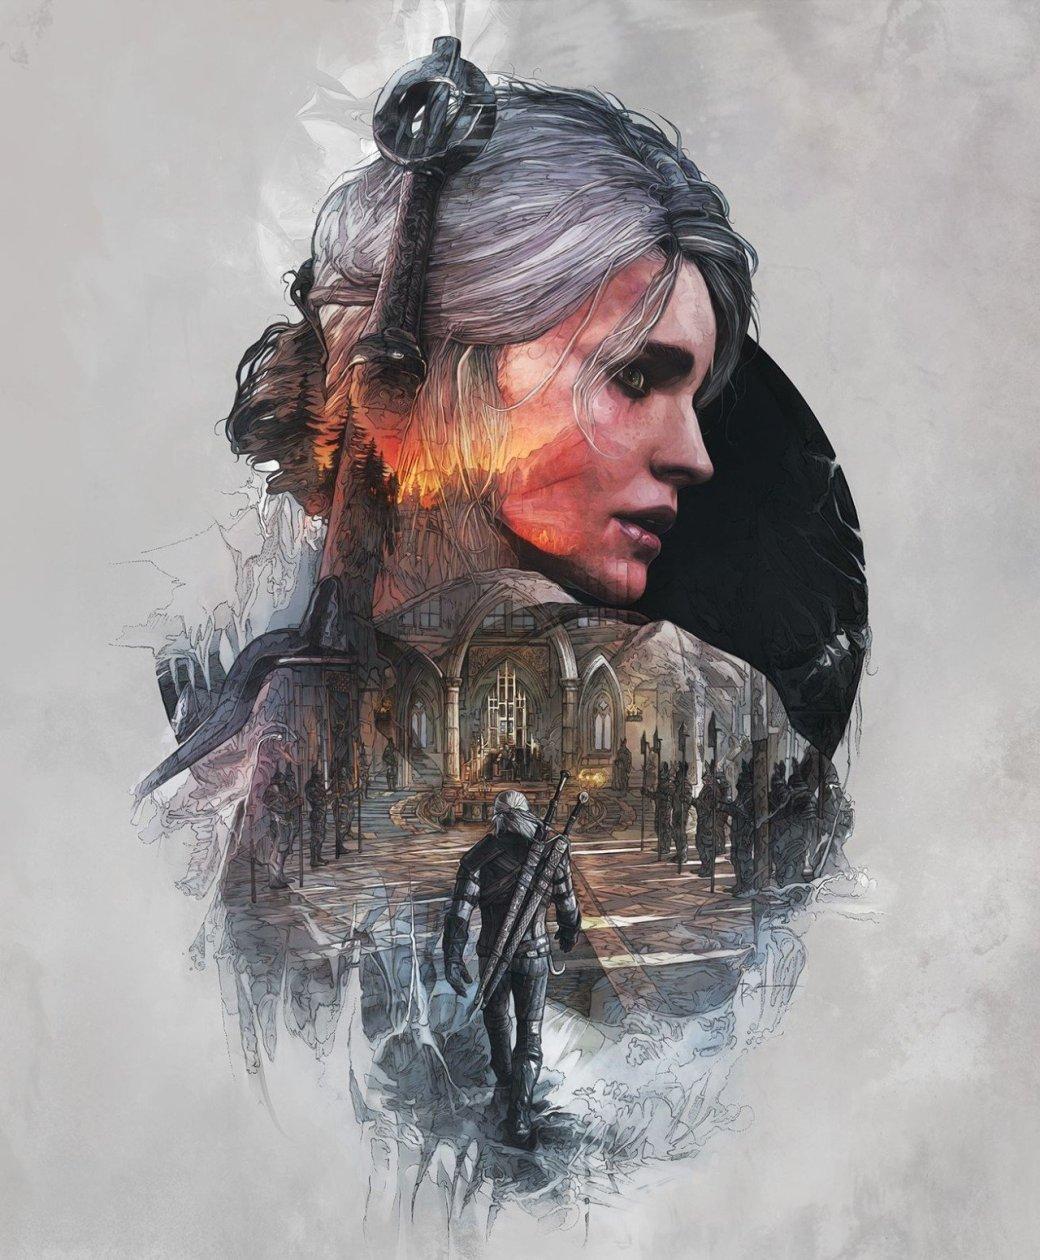 Рецензия на The Witcher 3: Wild Hunt - Изображение 2